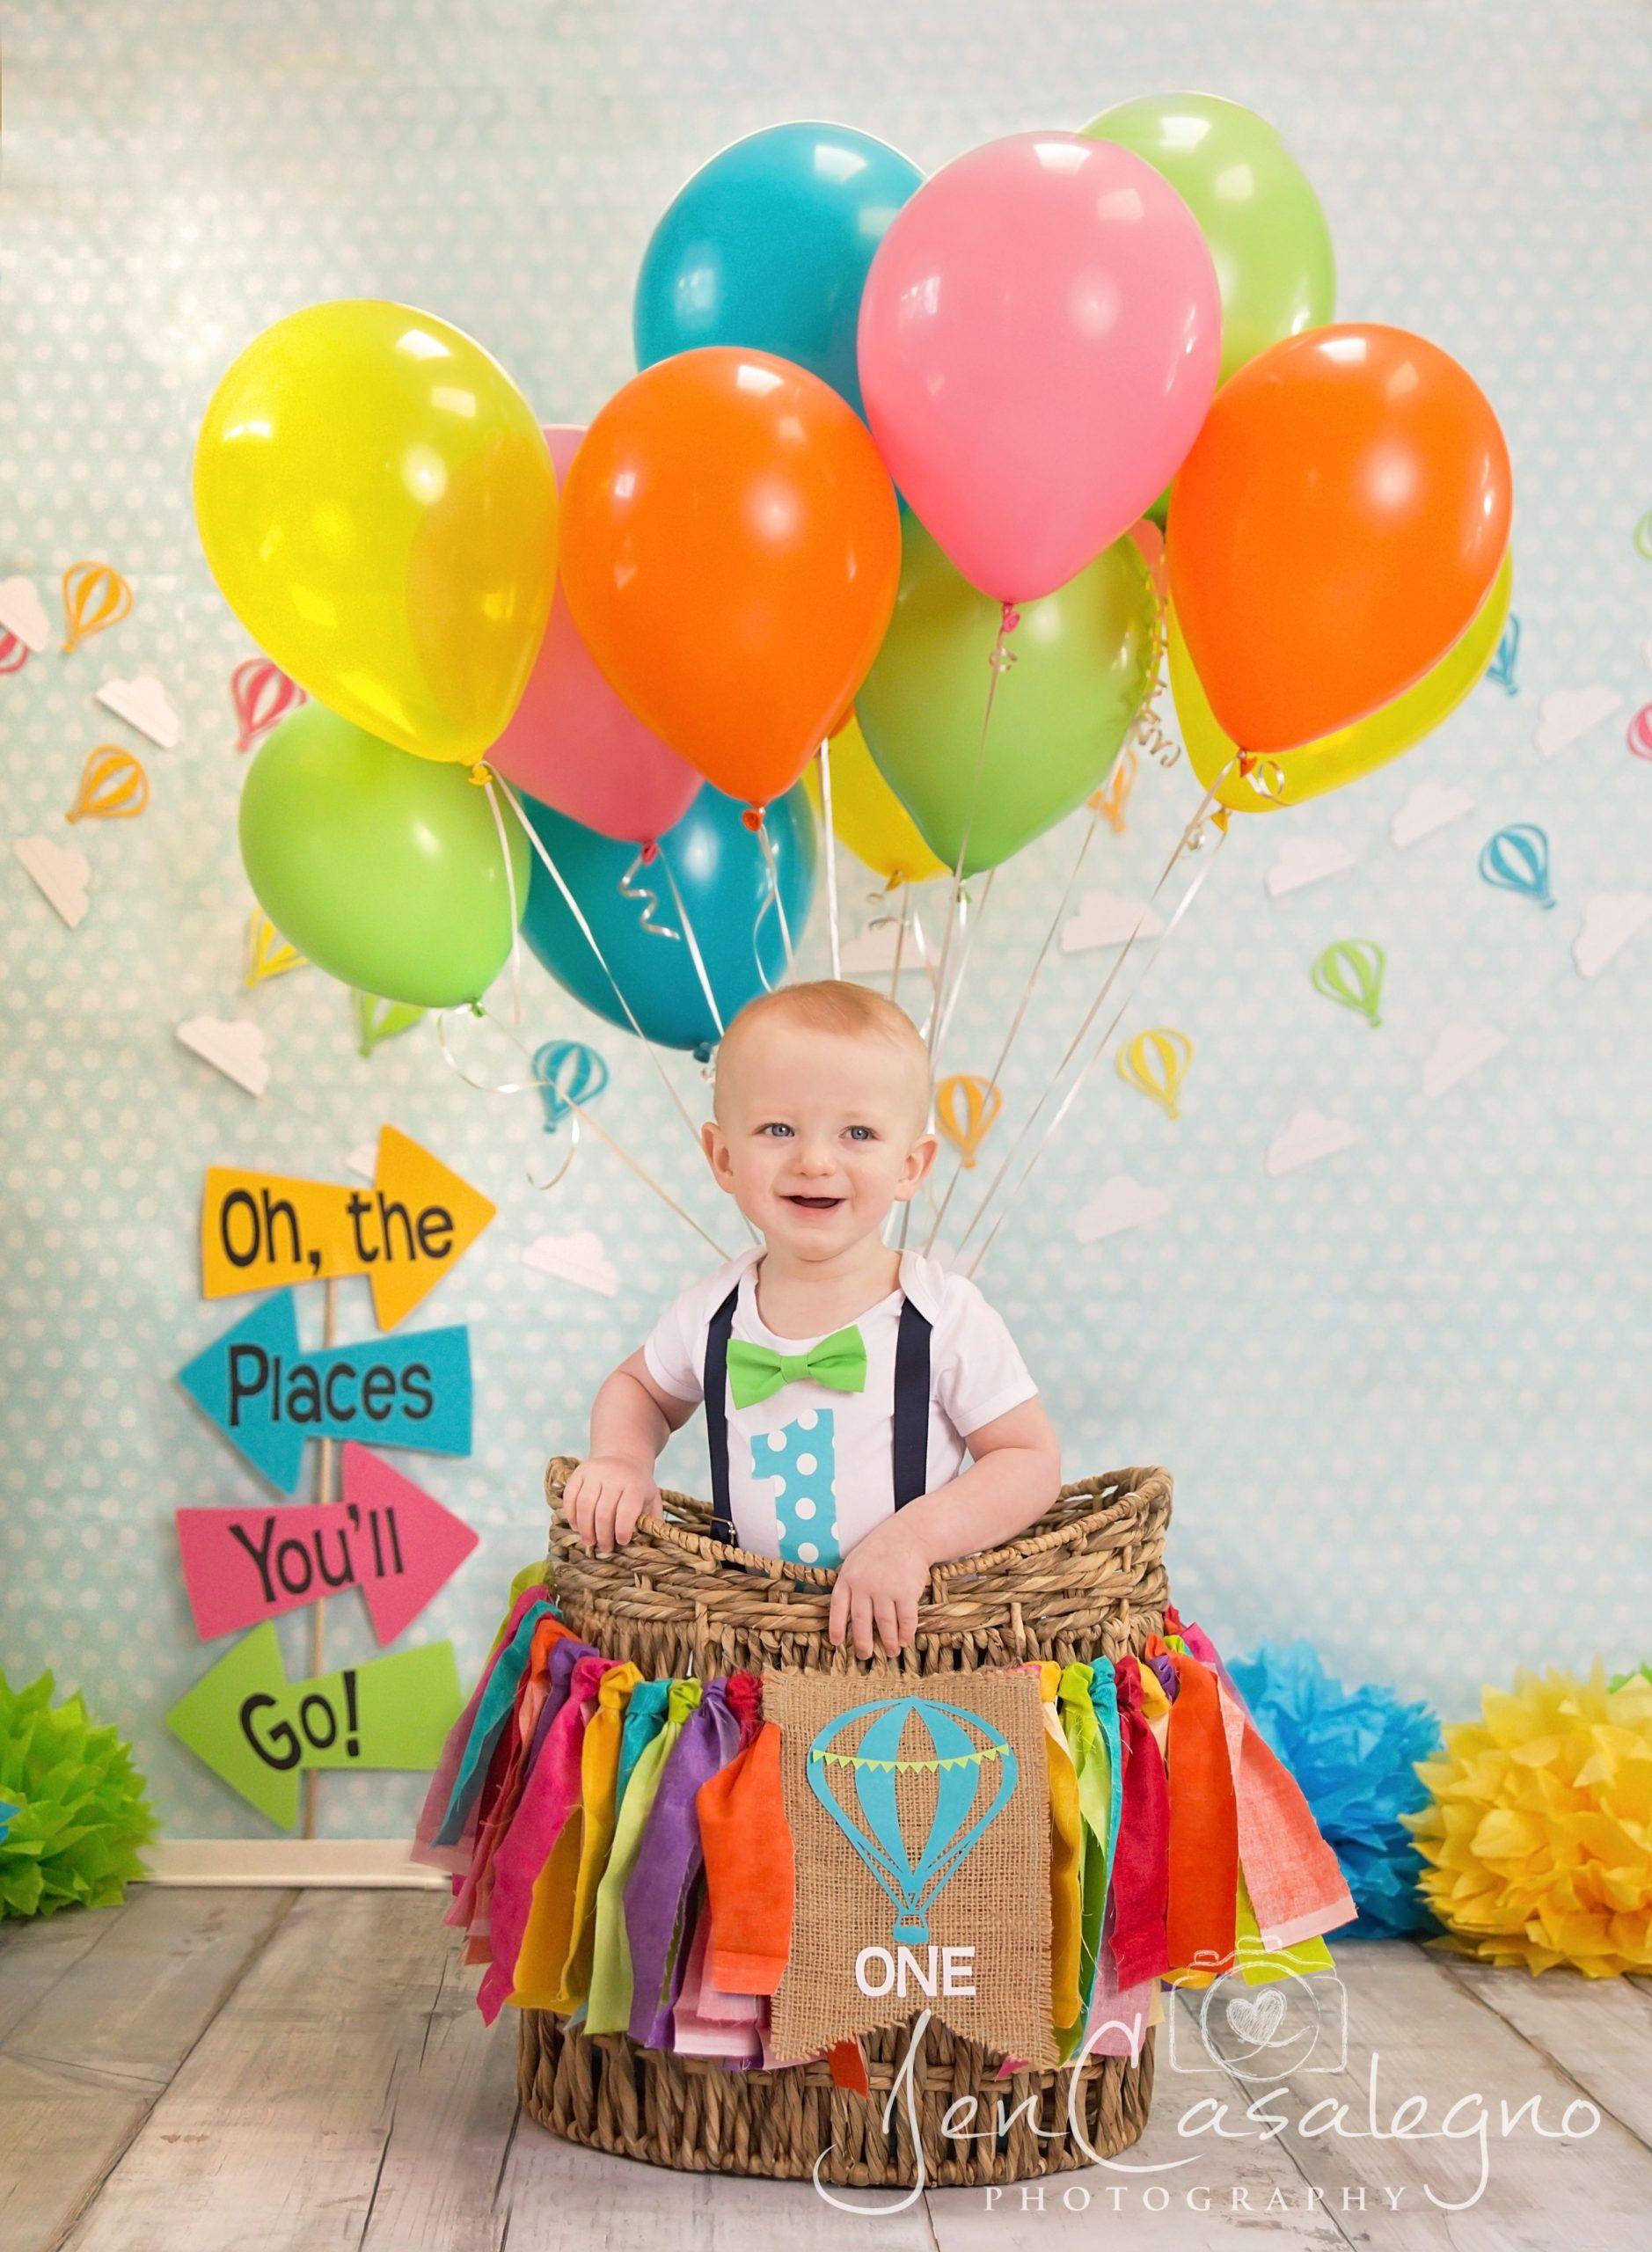 1st Birthday Party Places For Inspiration Birthday Ideas Make It Heissluftballon Basteln Erster Geburtstag Bilder Heissluftballon Party